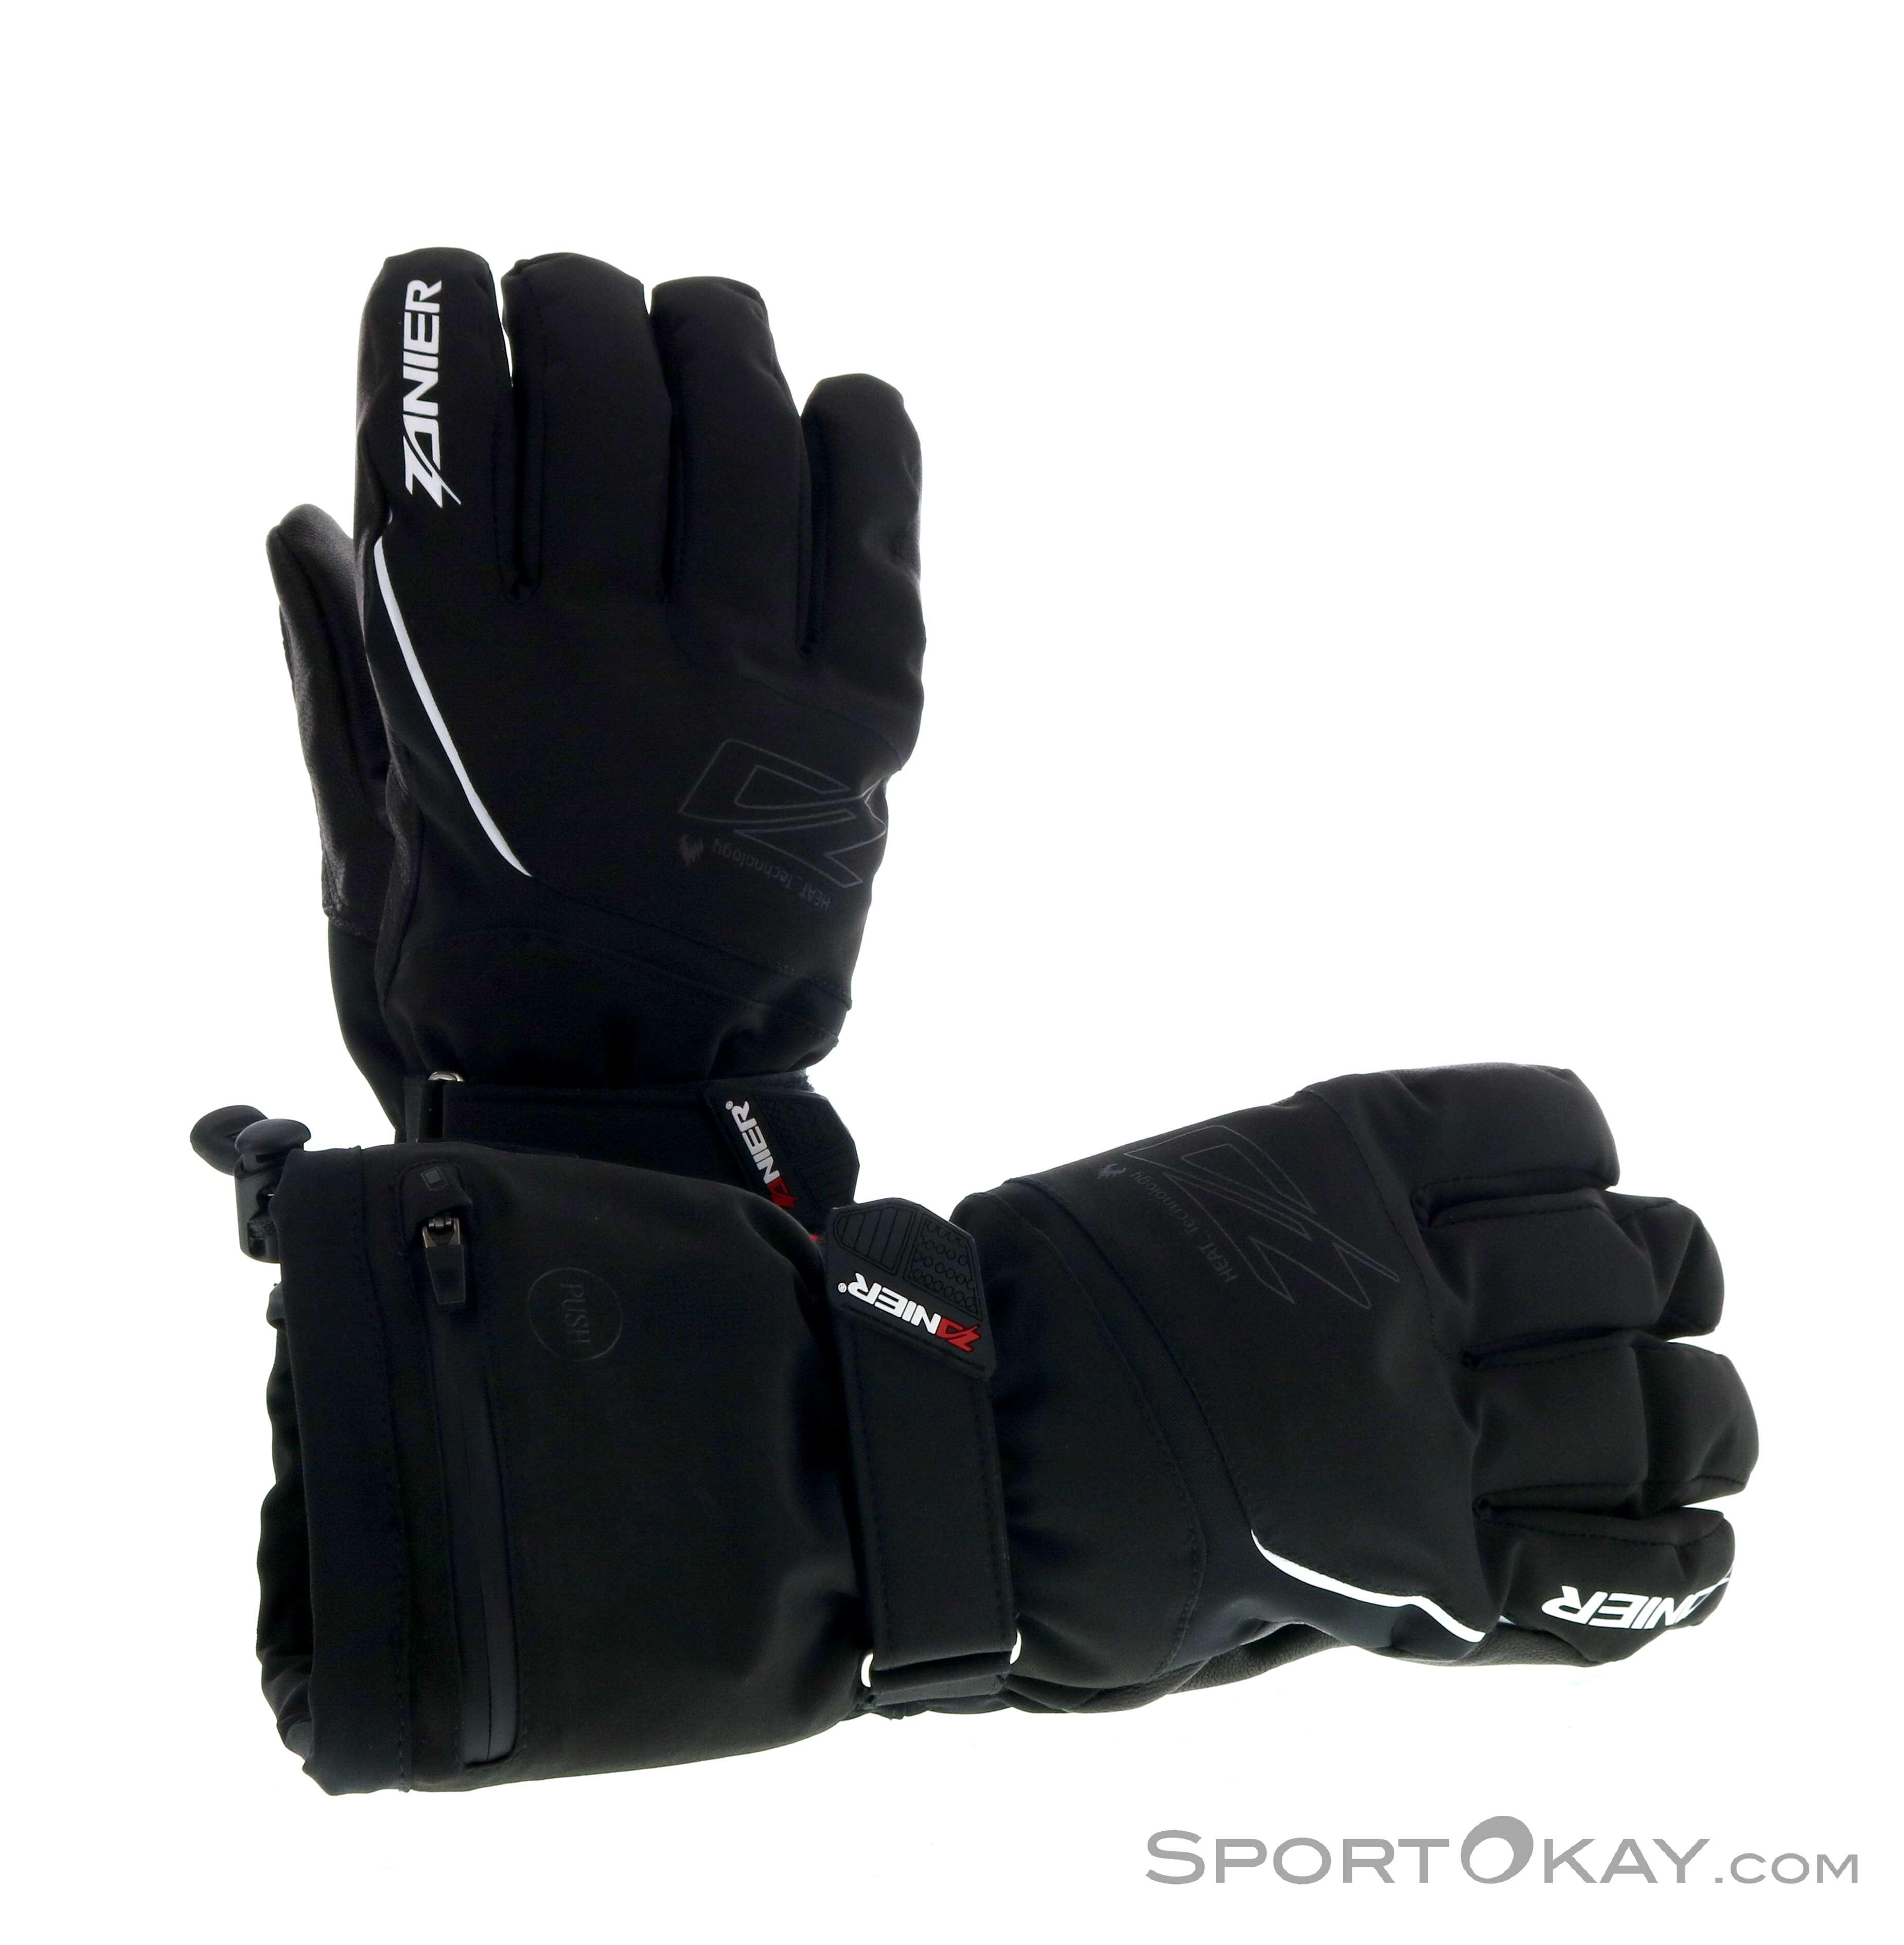 Zanier Heat ZX 3.0 Herren Handschuhe-Schwarz-M